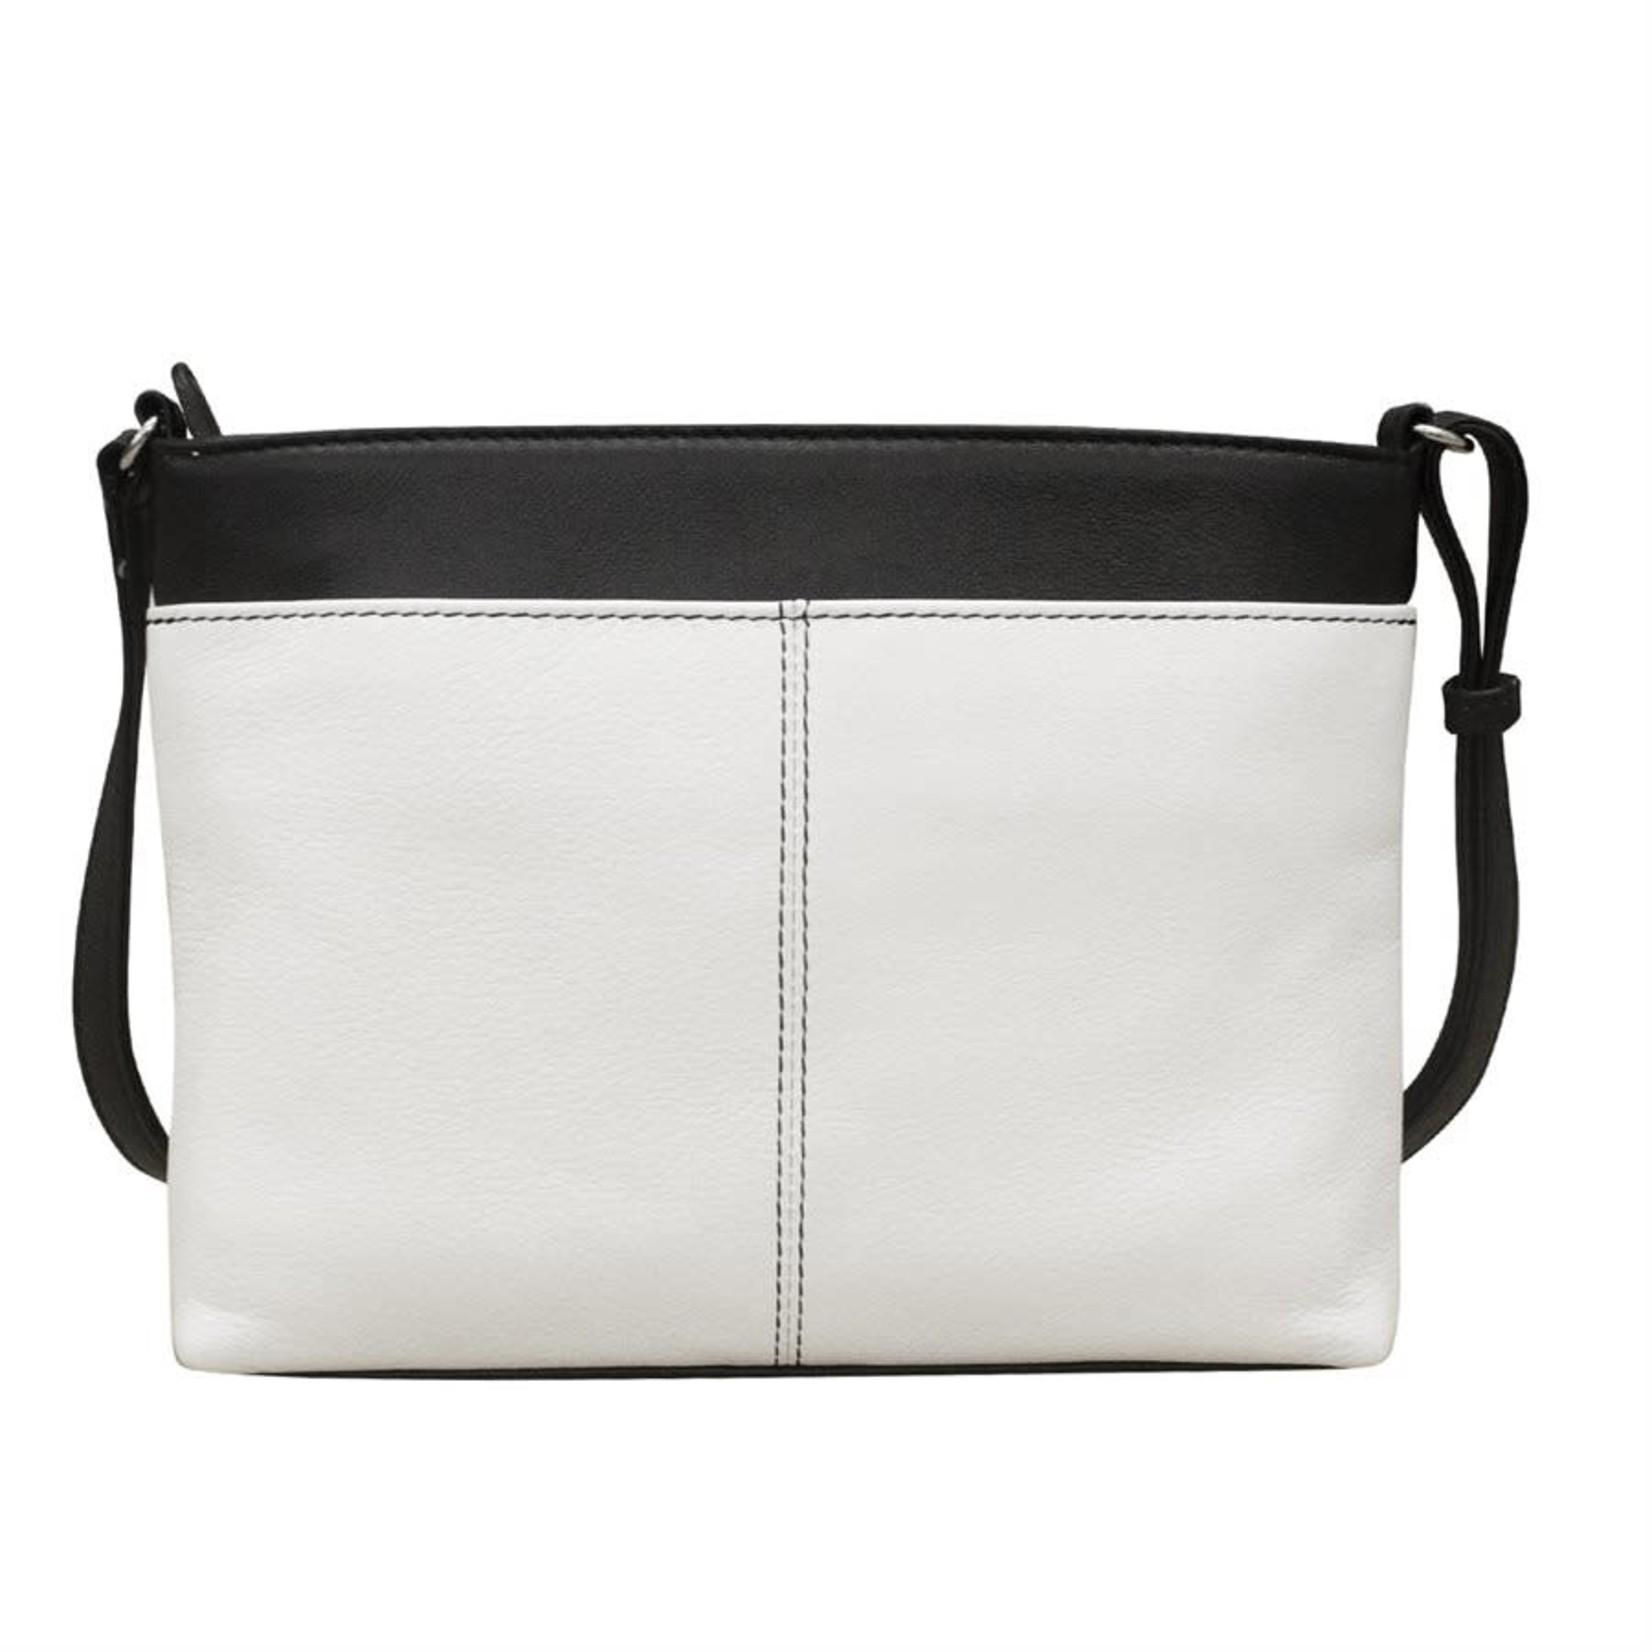 Leather Handbags and Accessories 6592 White/Black - Organizer Crossbody